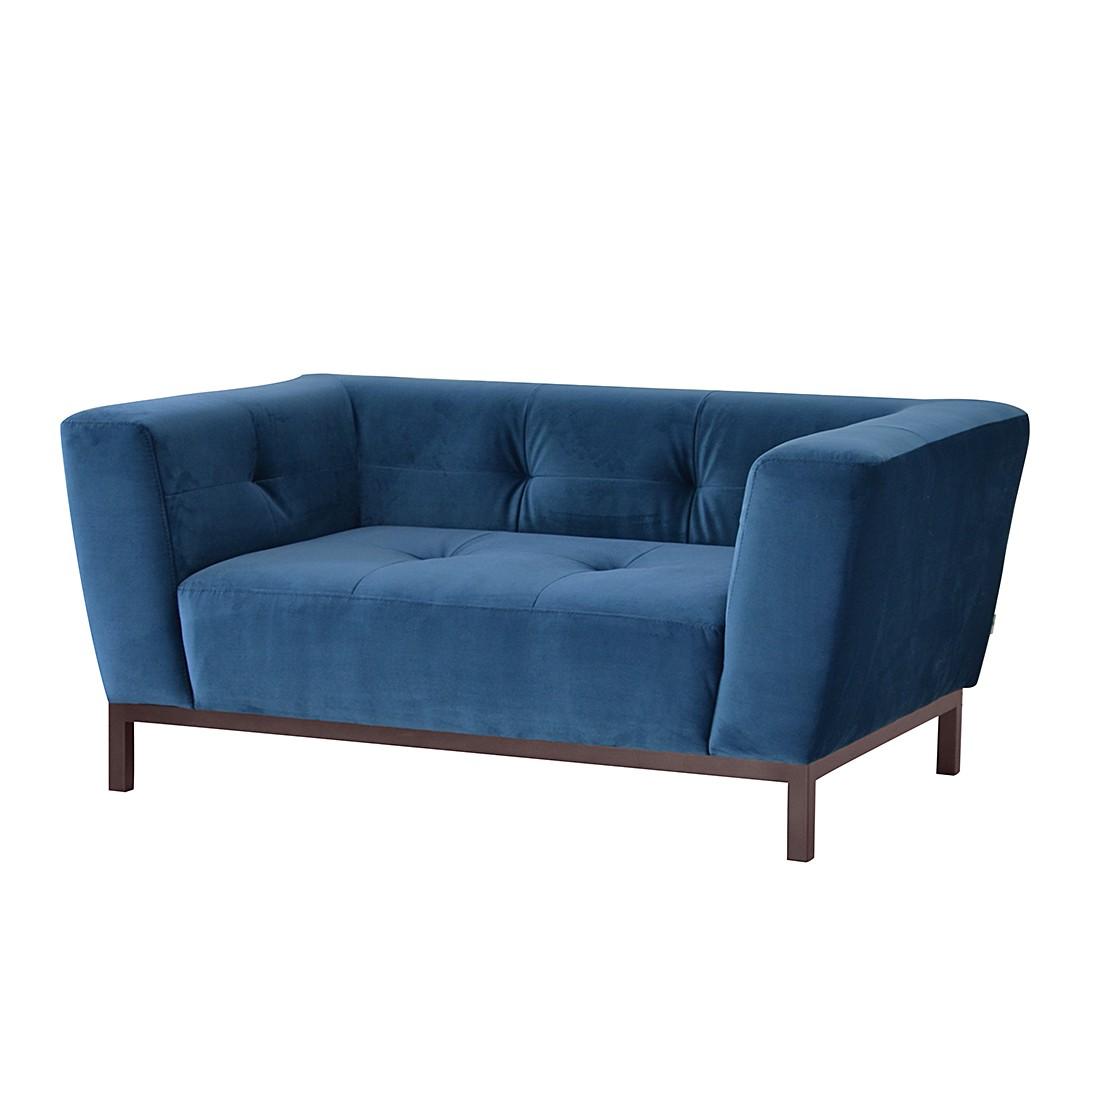 Sofa Bridget (2-Sitzer) – Microfaser – Dunkelblau, roomscape jetzt kaufen